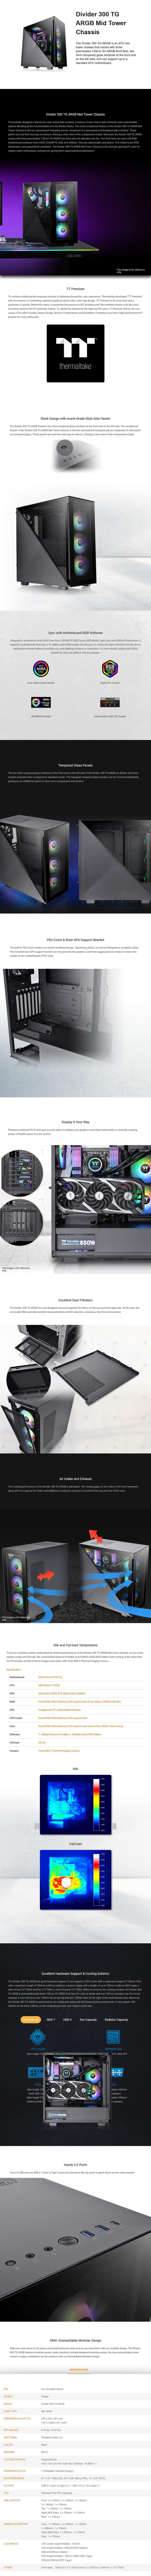 Thermaltake Divider 300 TG Tempered Glass ARGB Mid Tower Case - Black - Overview 1